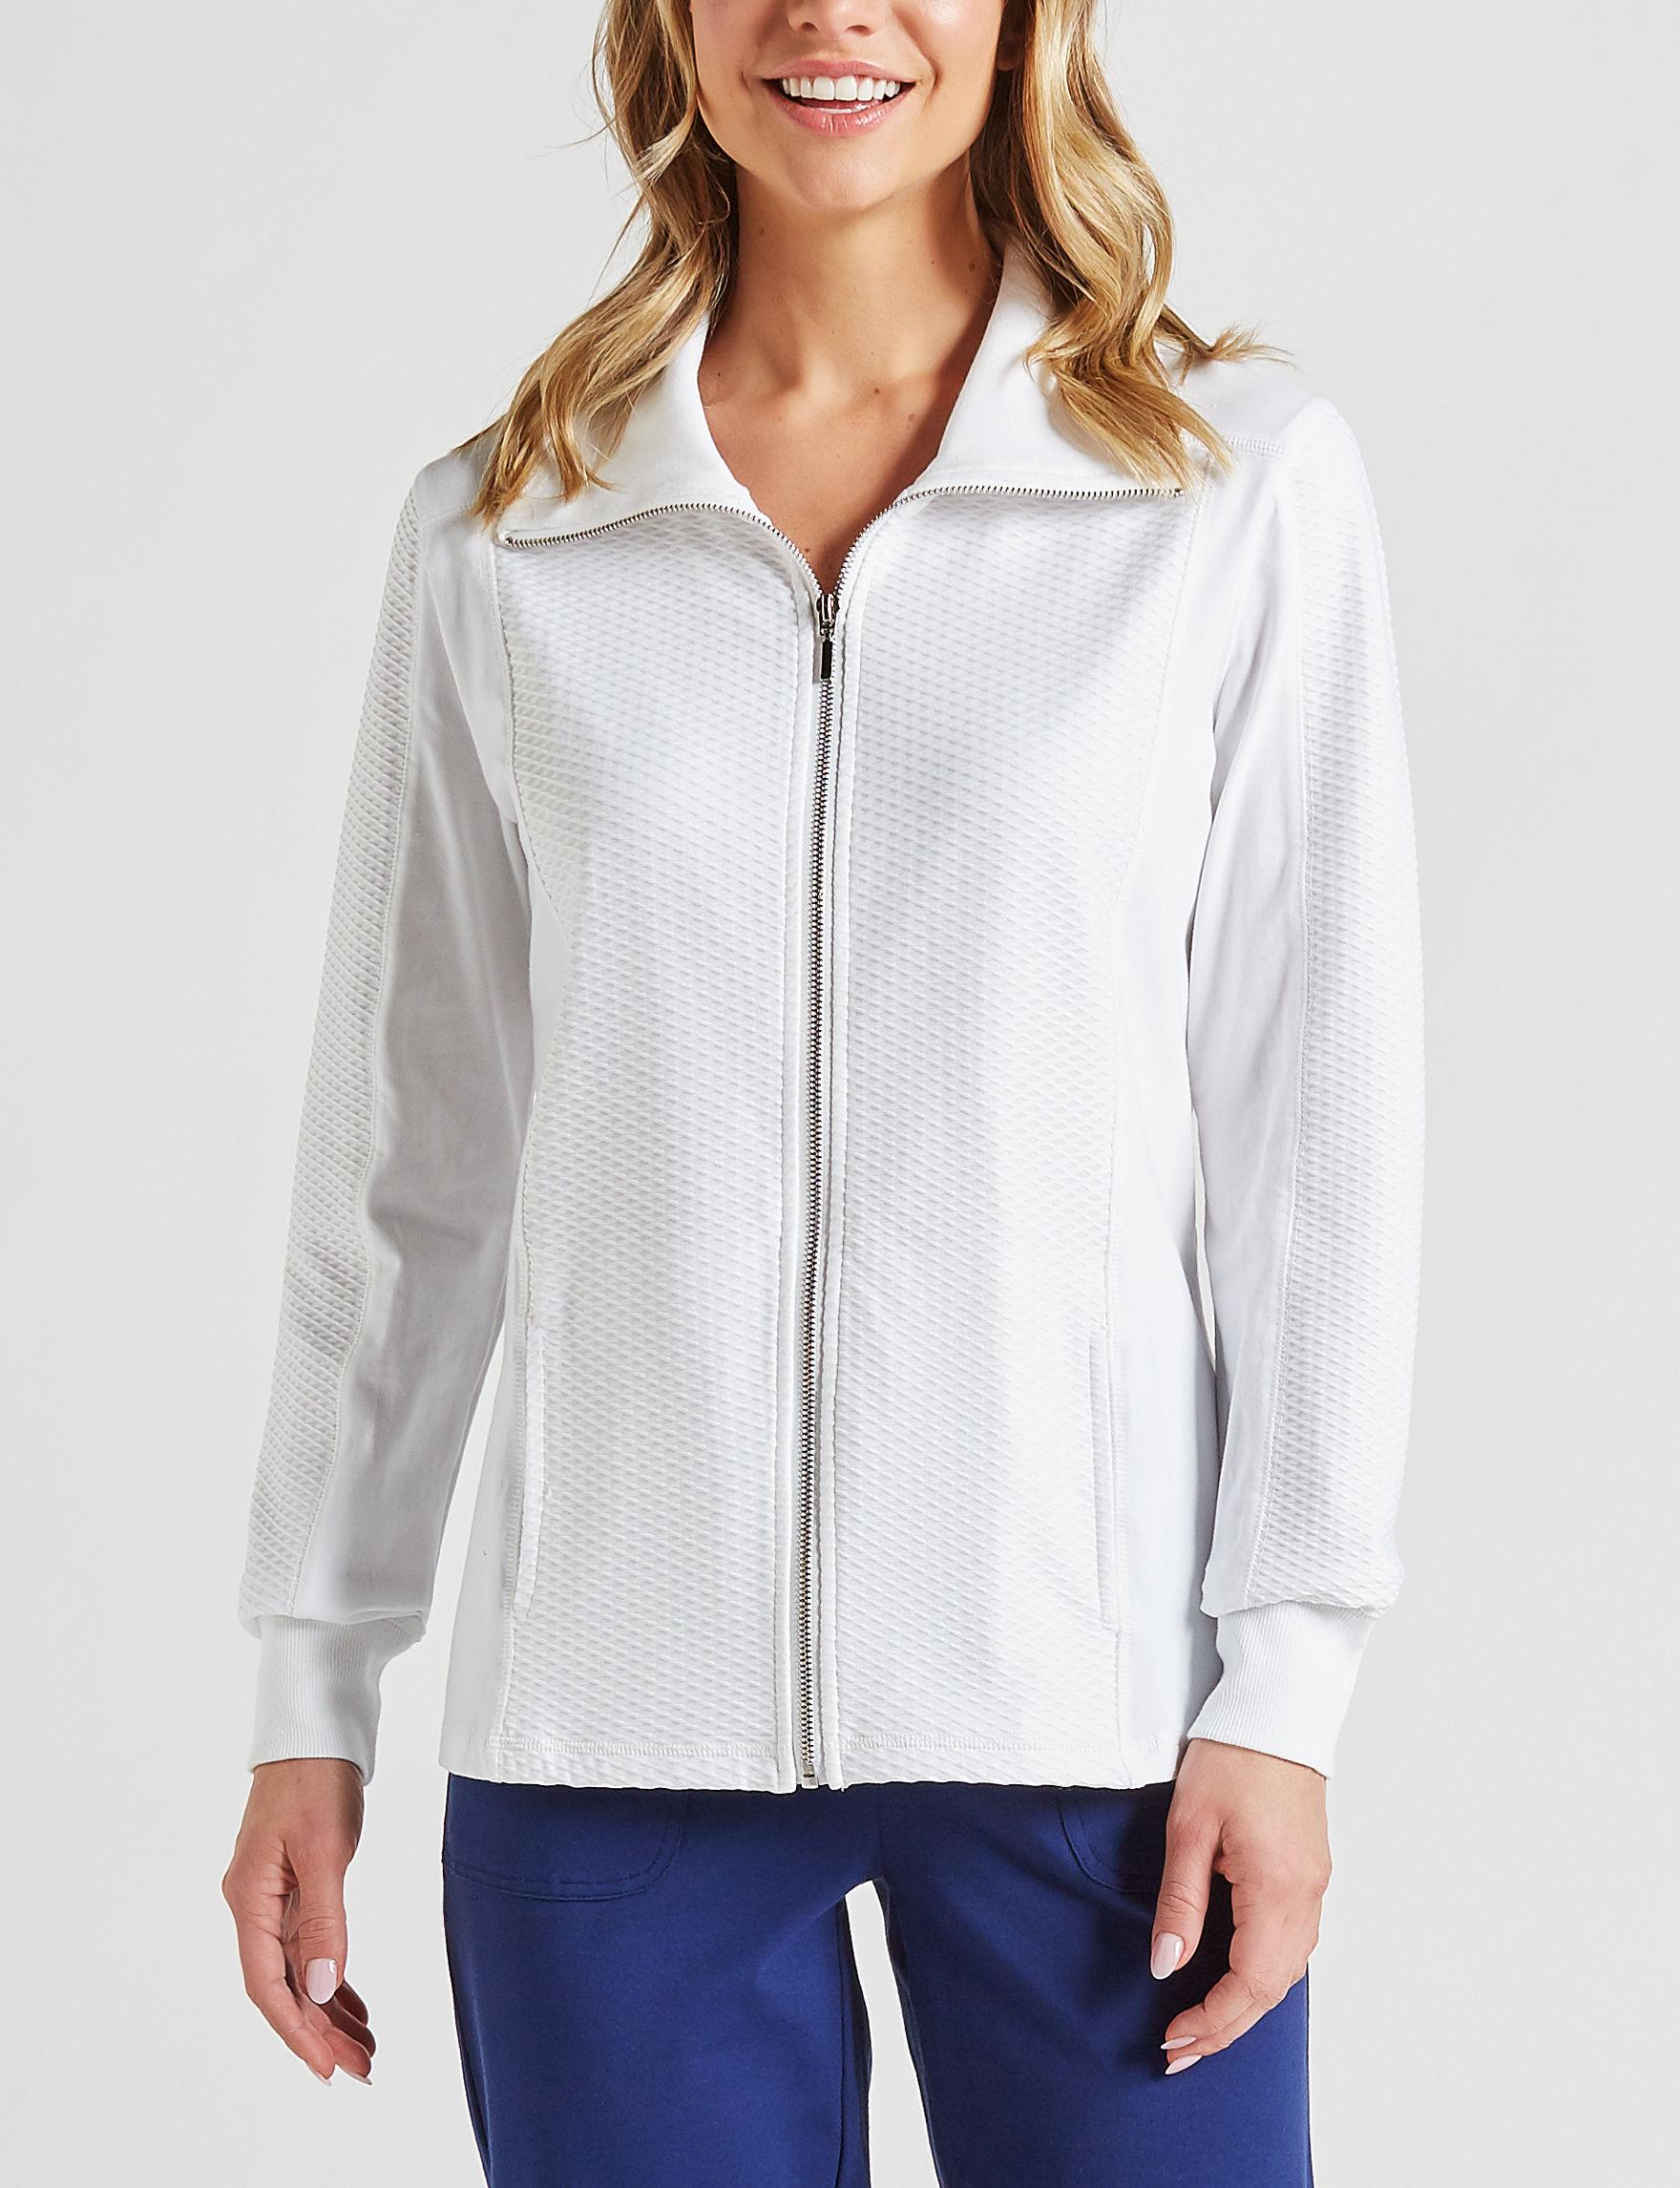 Onyx White Lightweight Jackets & Blazers